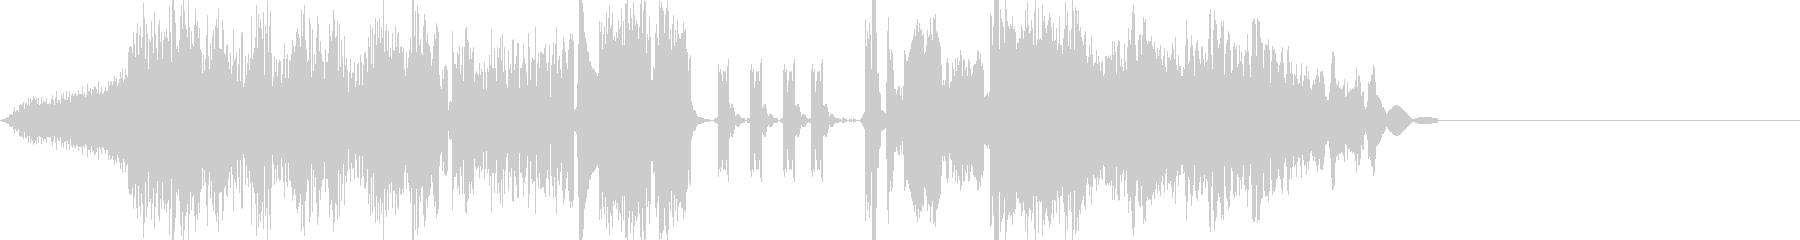 FMラジオジングル制作の効果音にピッタリの未再生の波形